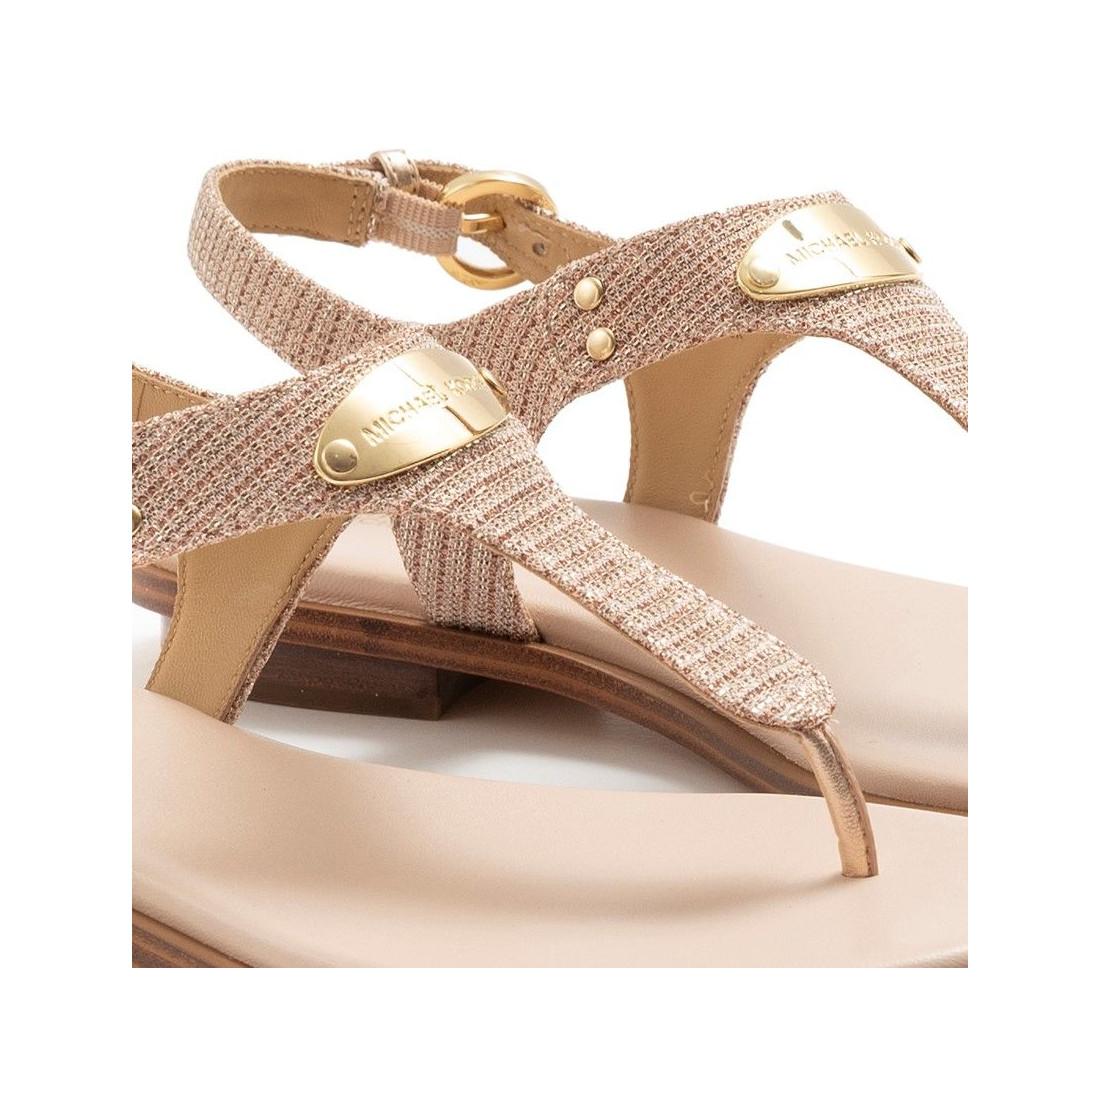 sandals woman michael kors 40s0mkfa3d674 6810